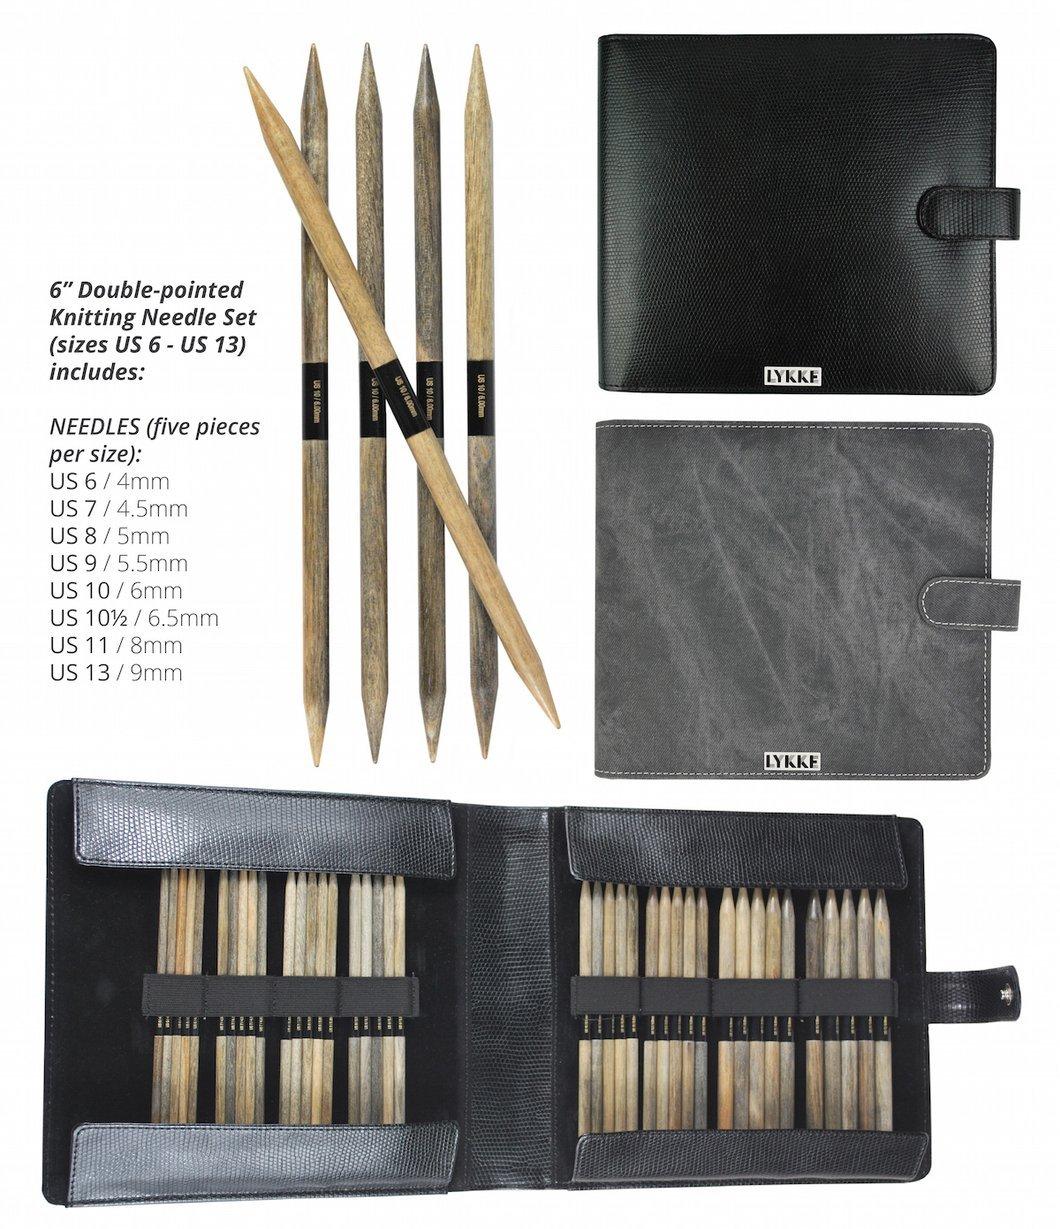 Driftwood Needle Sets by Lykke